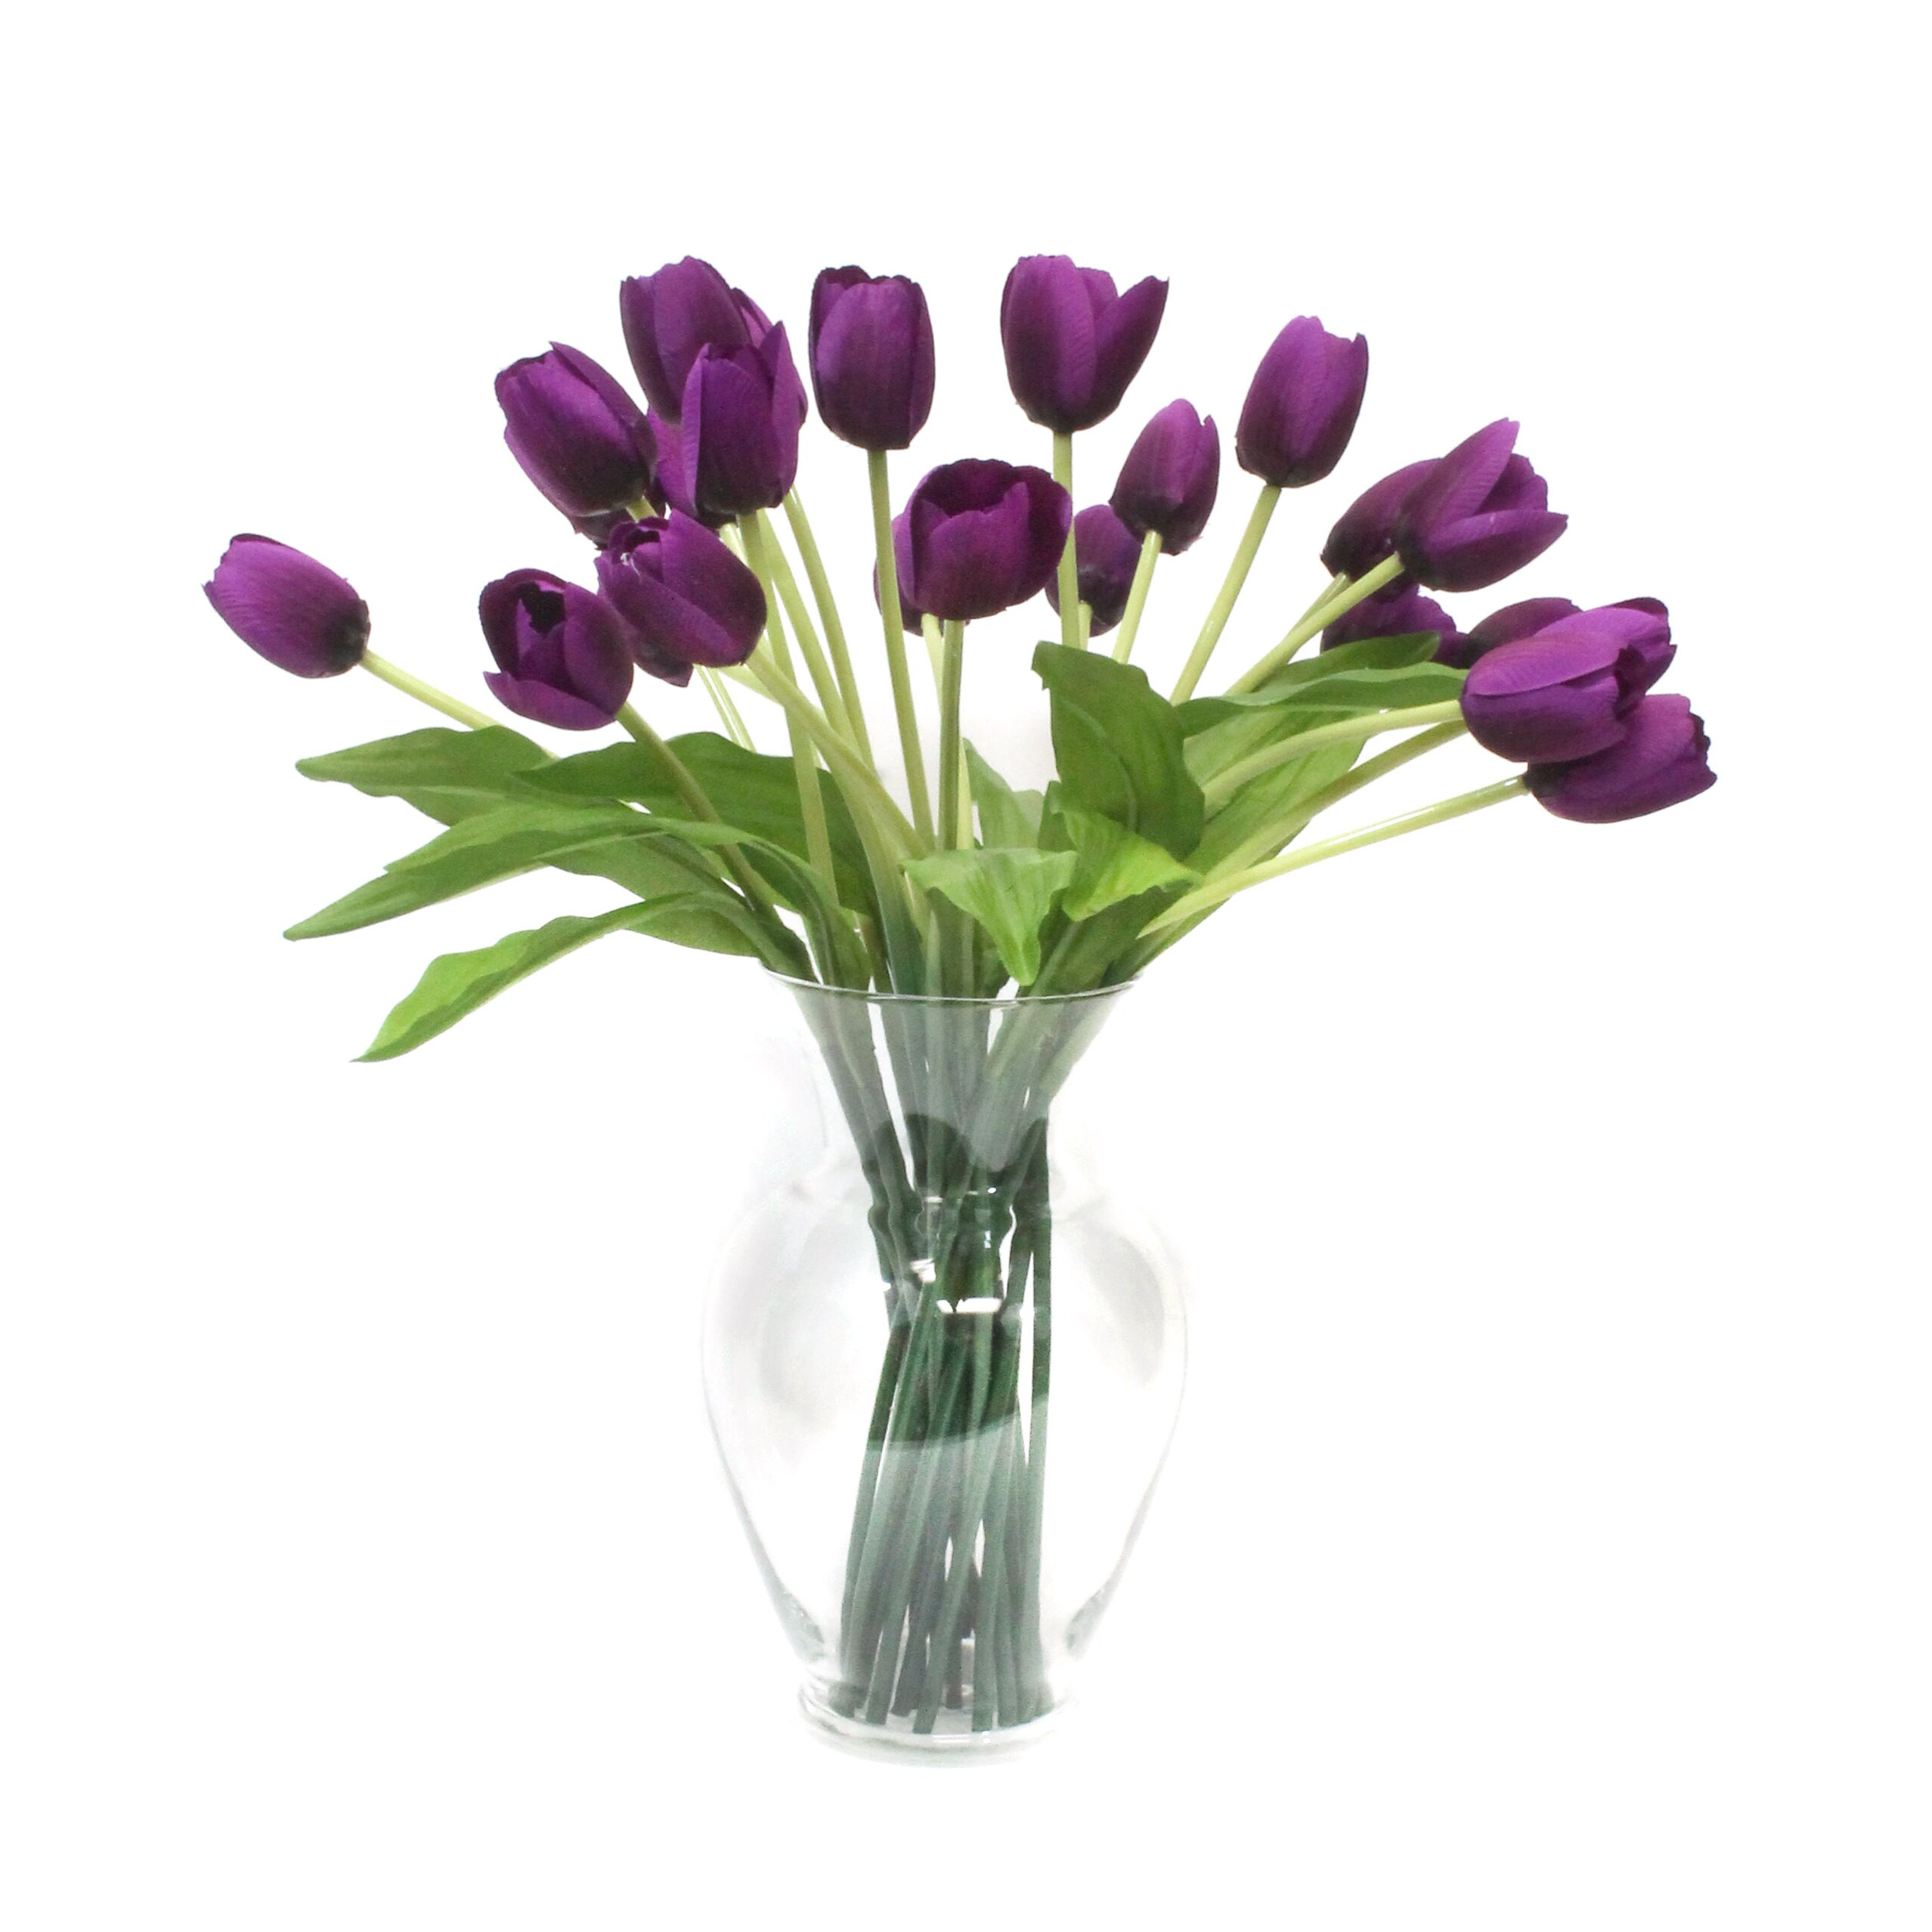 Dalmarko Designs Tulips In Glass Vase Amp Reviews Wayfair